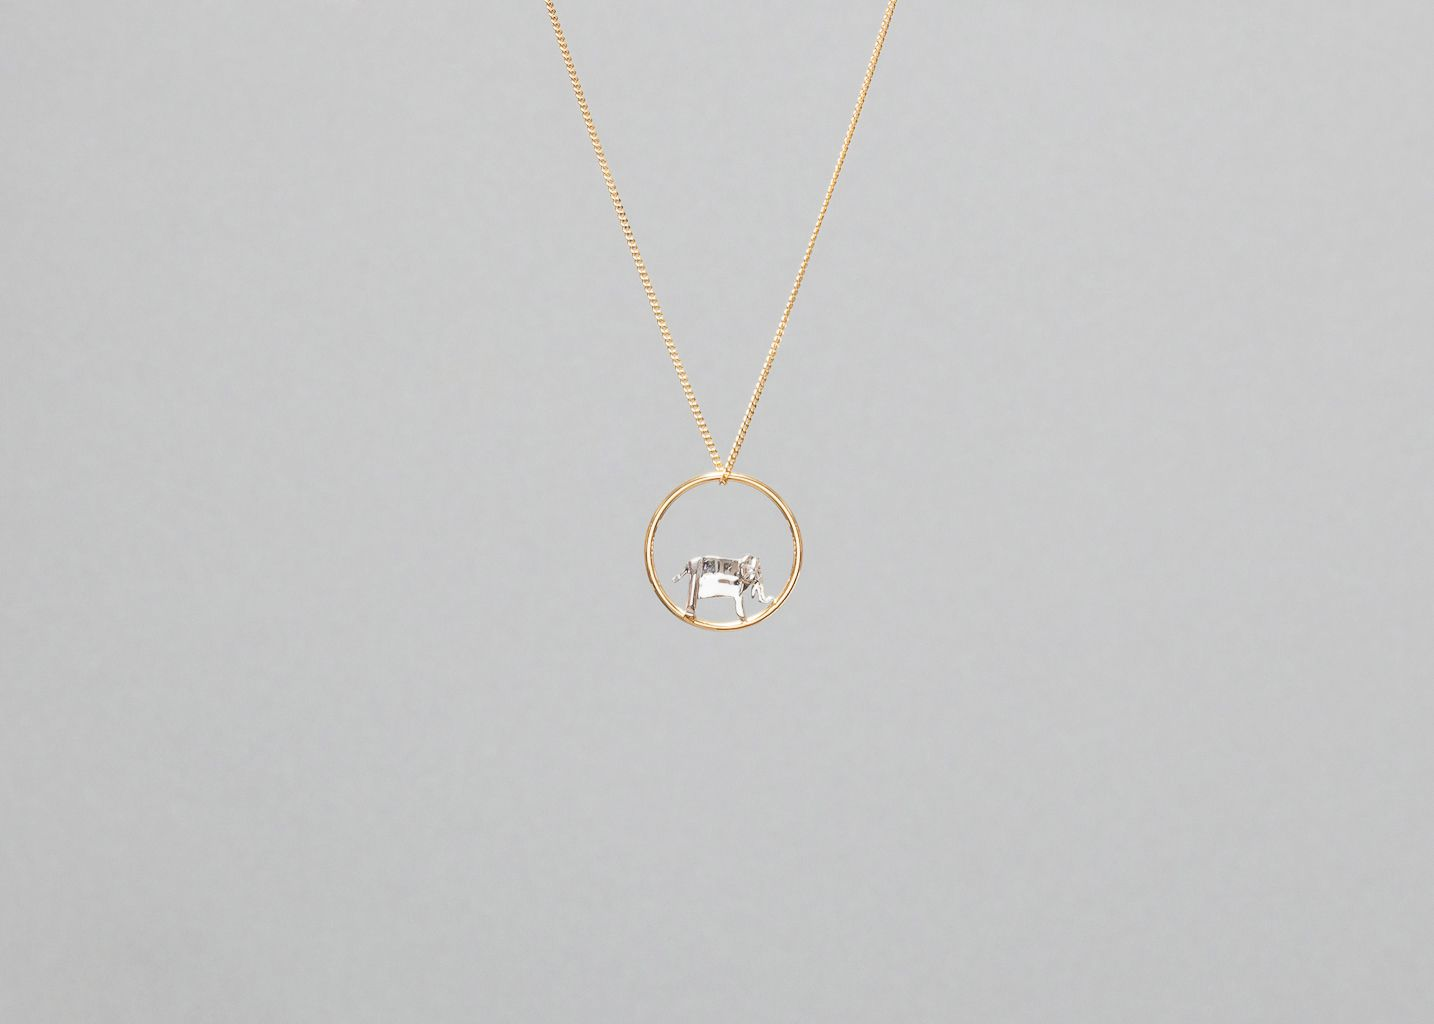 Collier Cercle Elephant Origami - Origami Jewellery